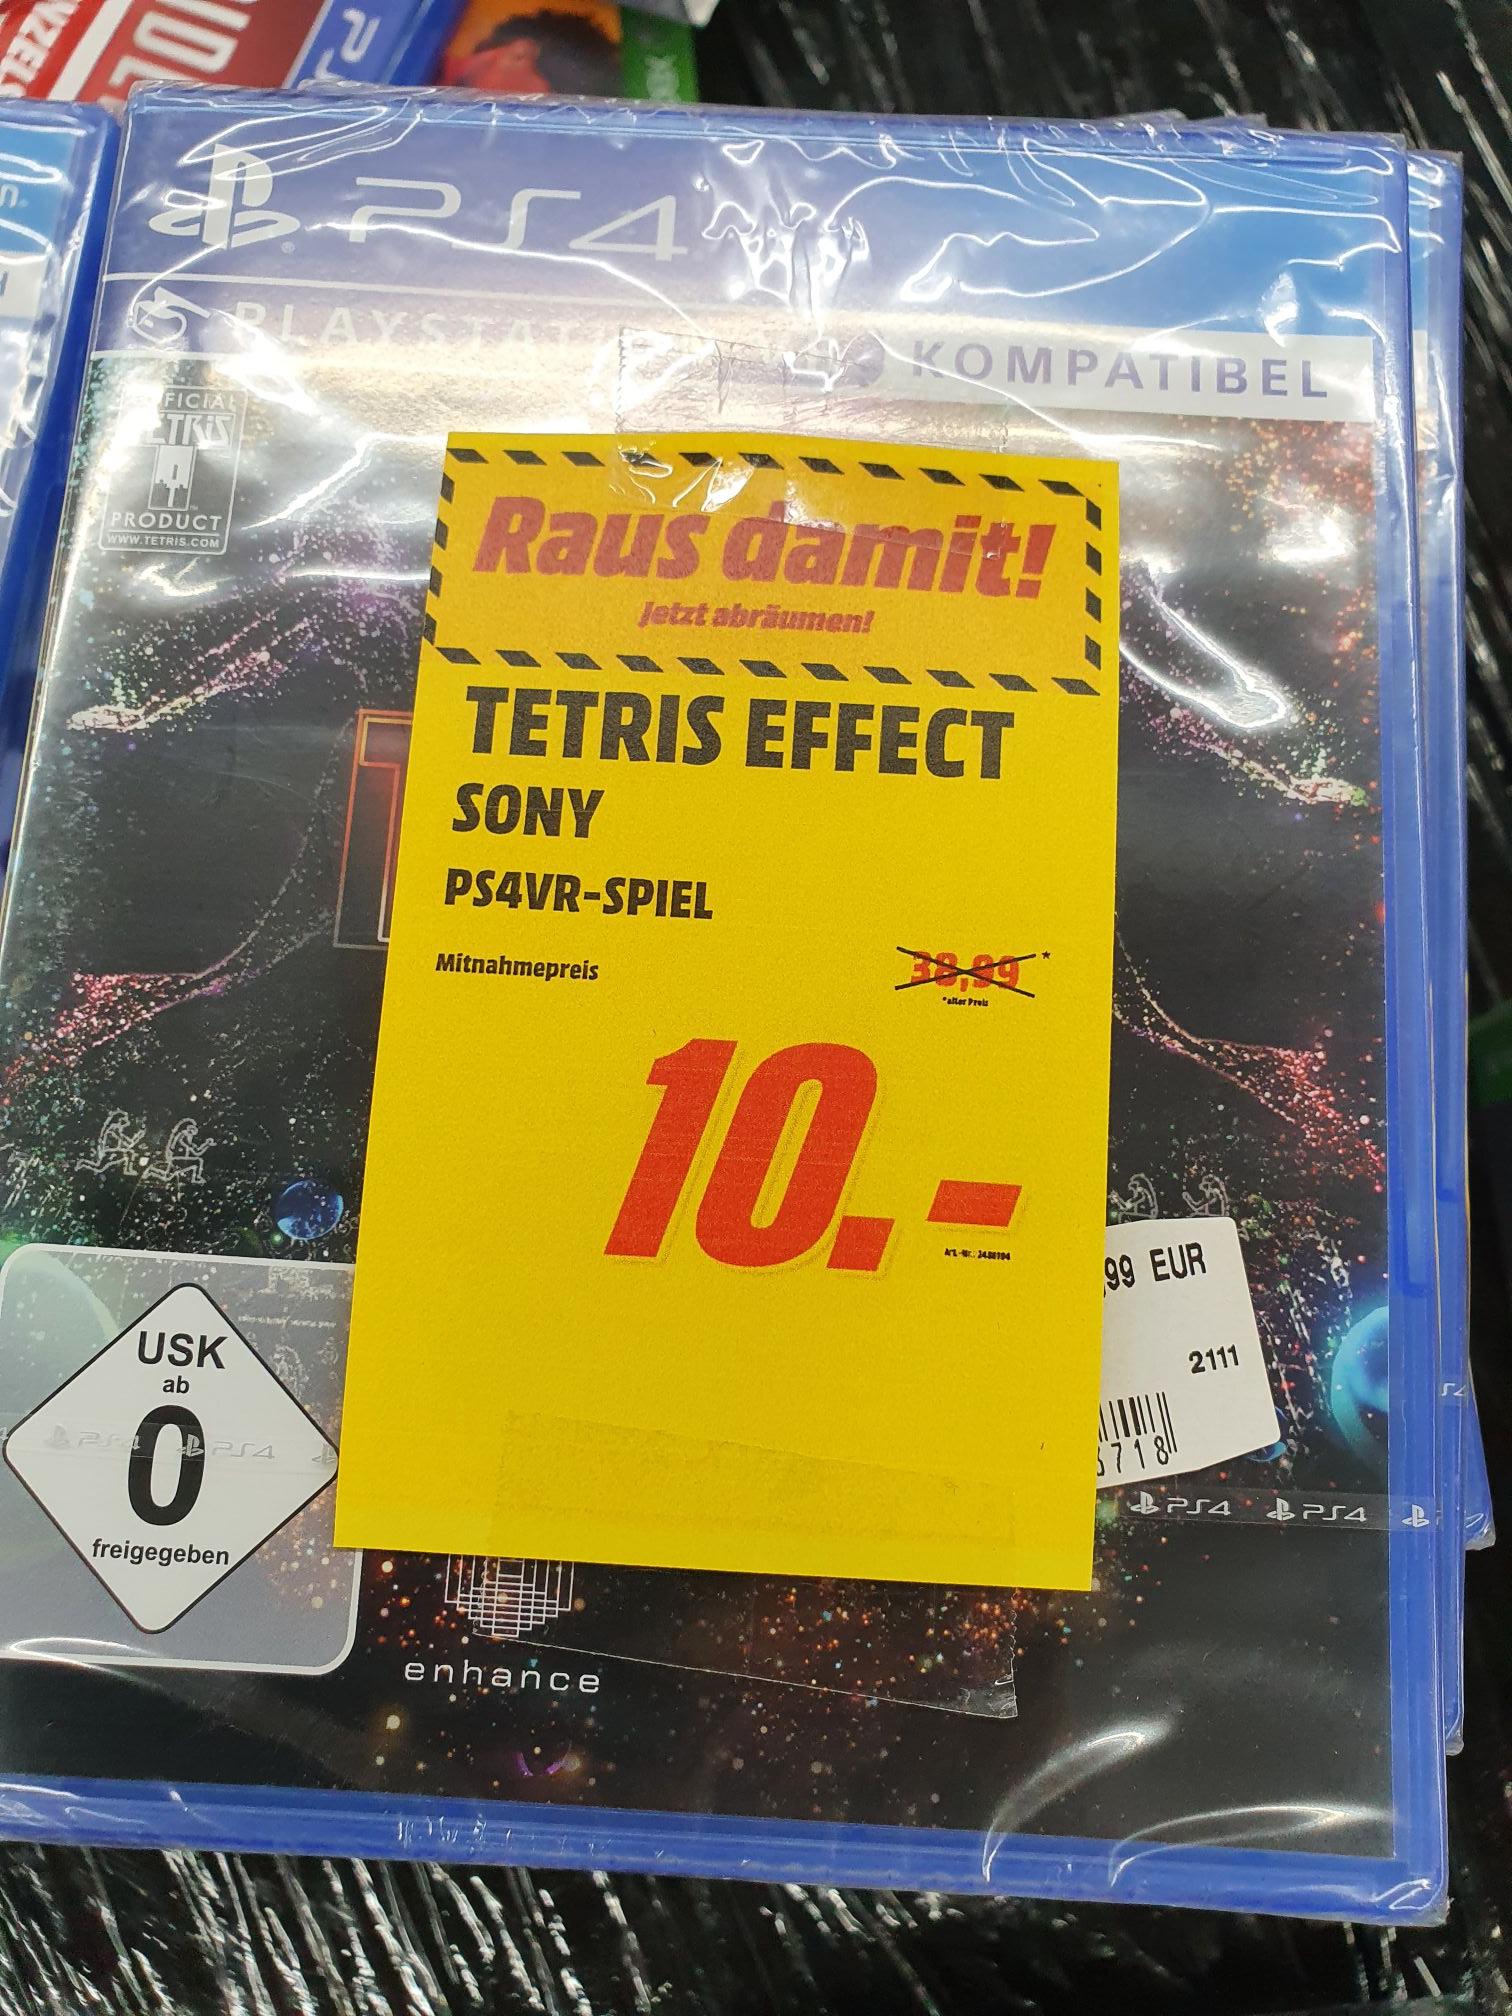 Lokal Media Markt Krefeld PS4 VR Tetris Effect oder Astro Bot Rescue Mission